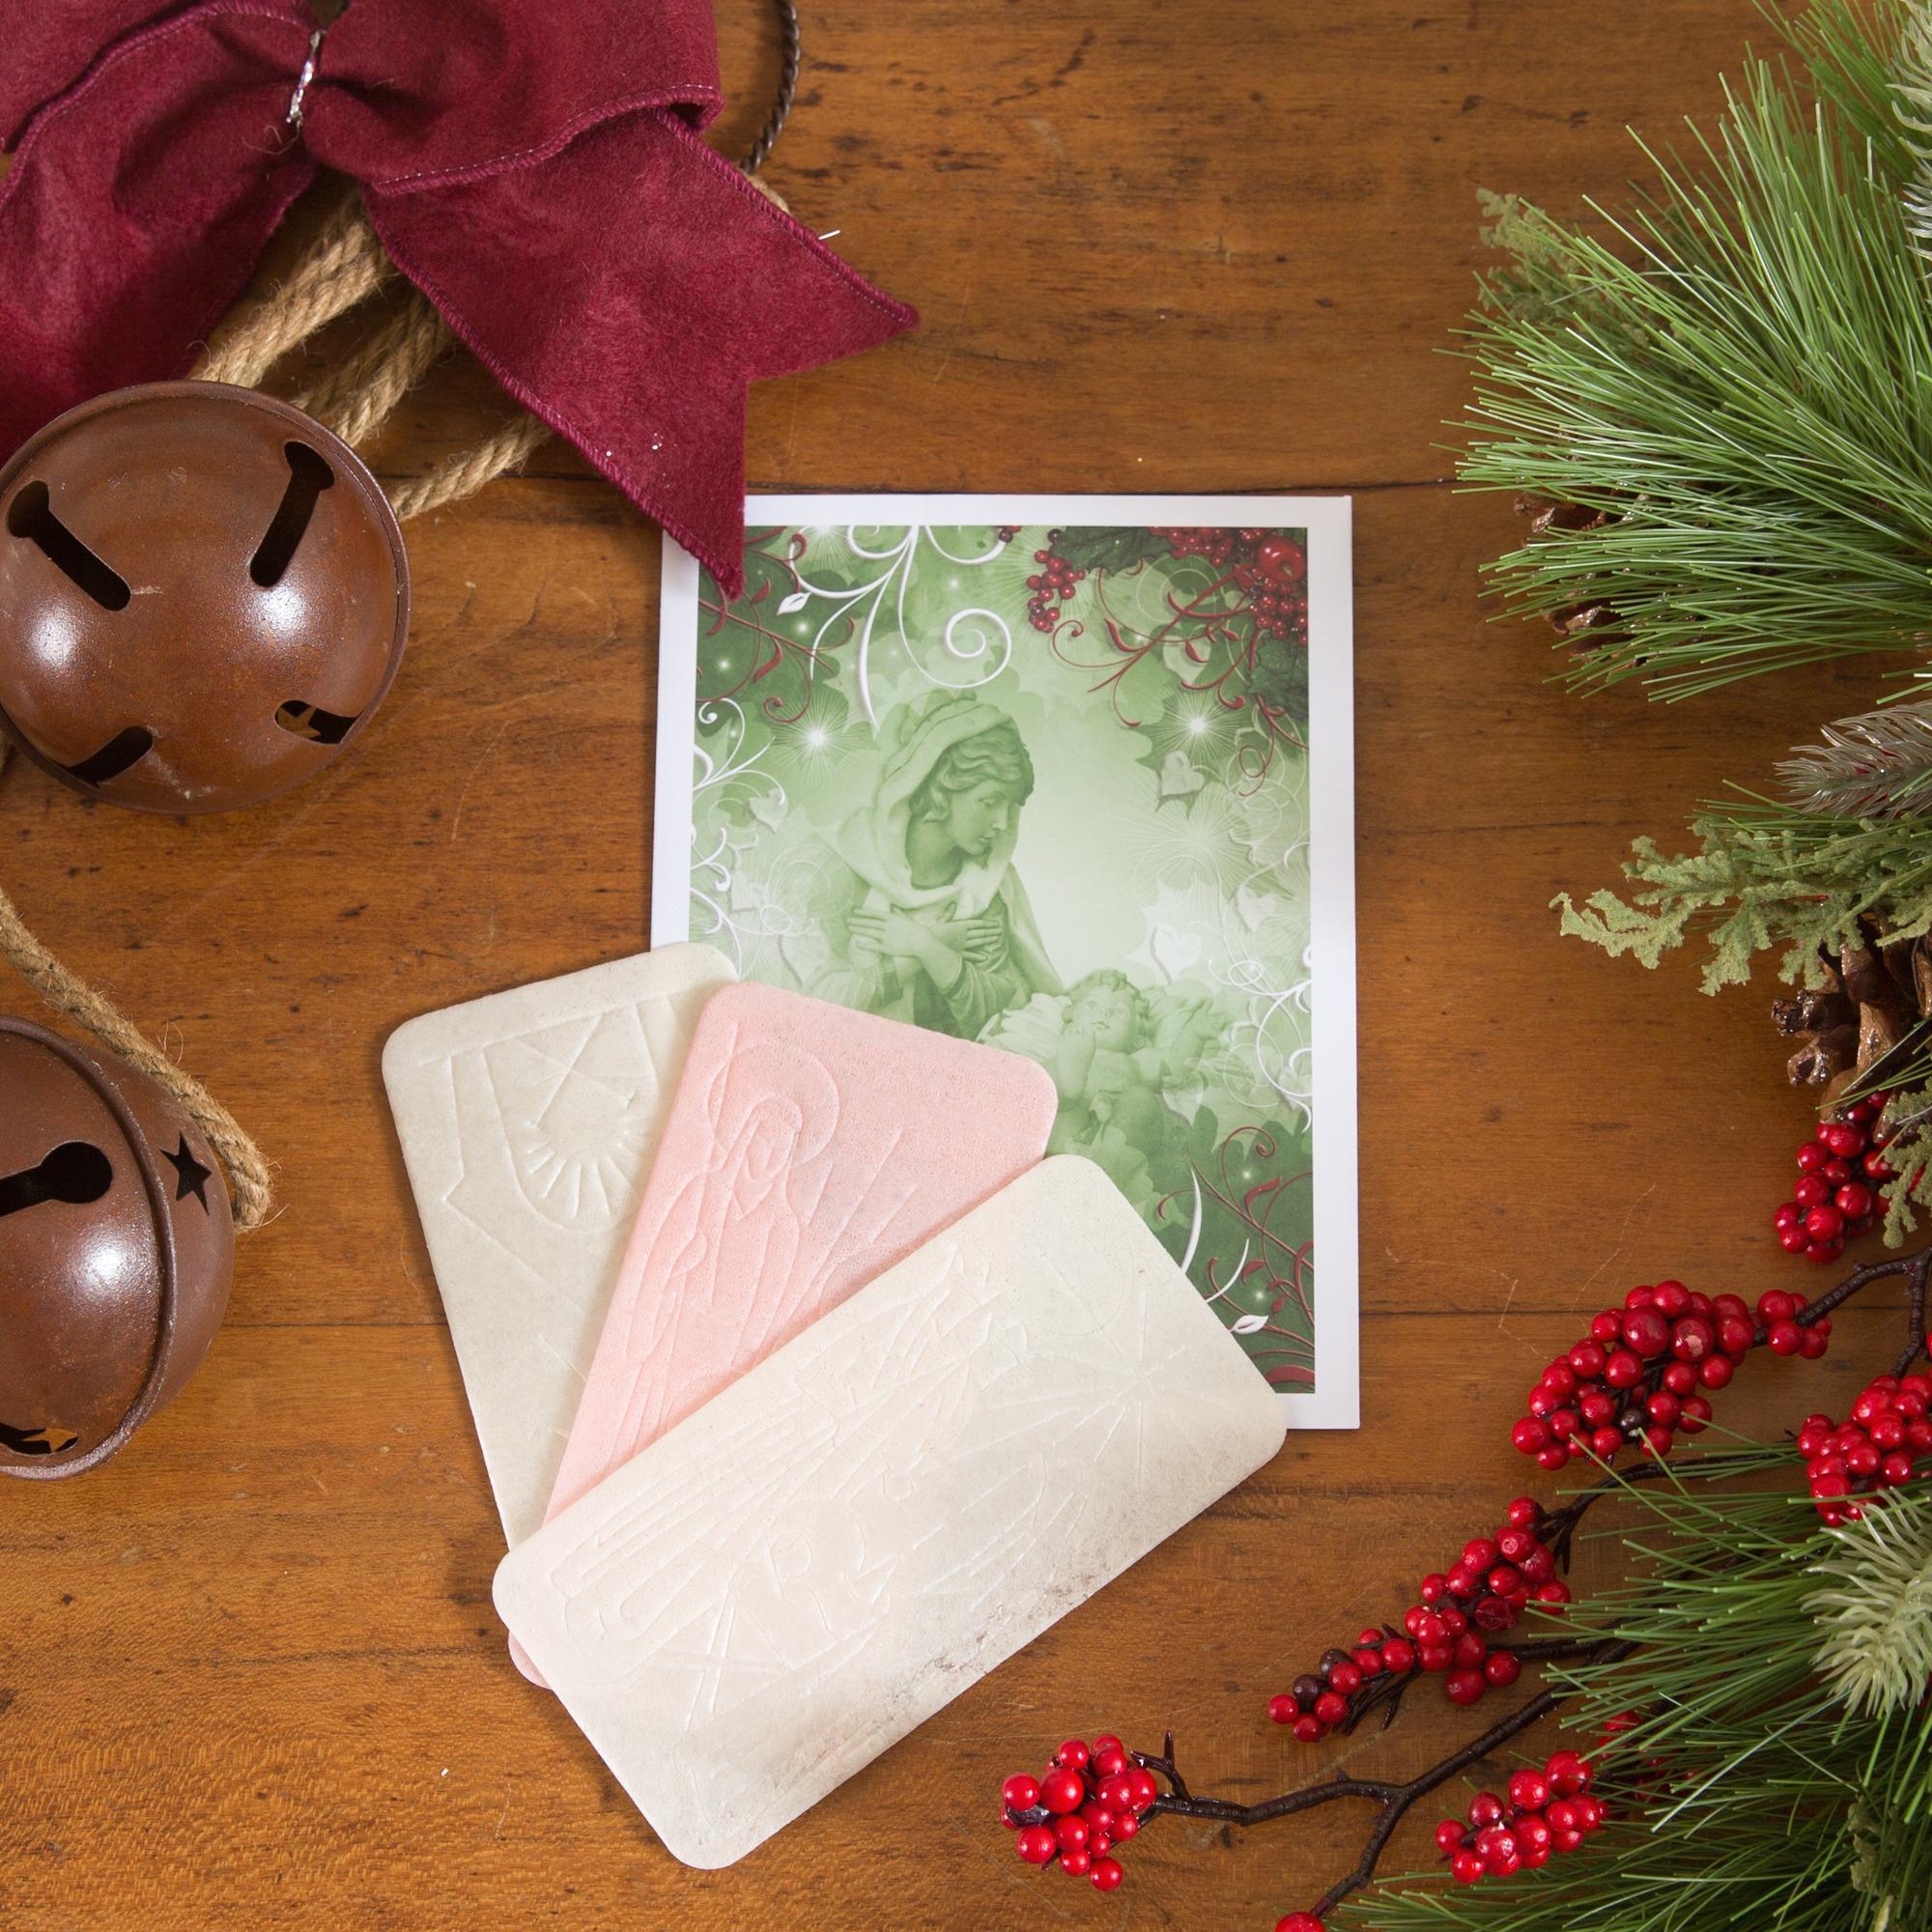 Oplatki Christmas Wafers (Oplatek) | The Catholic Company